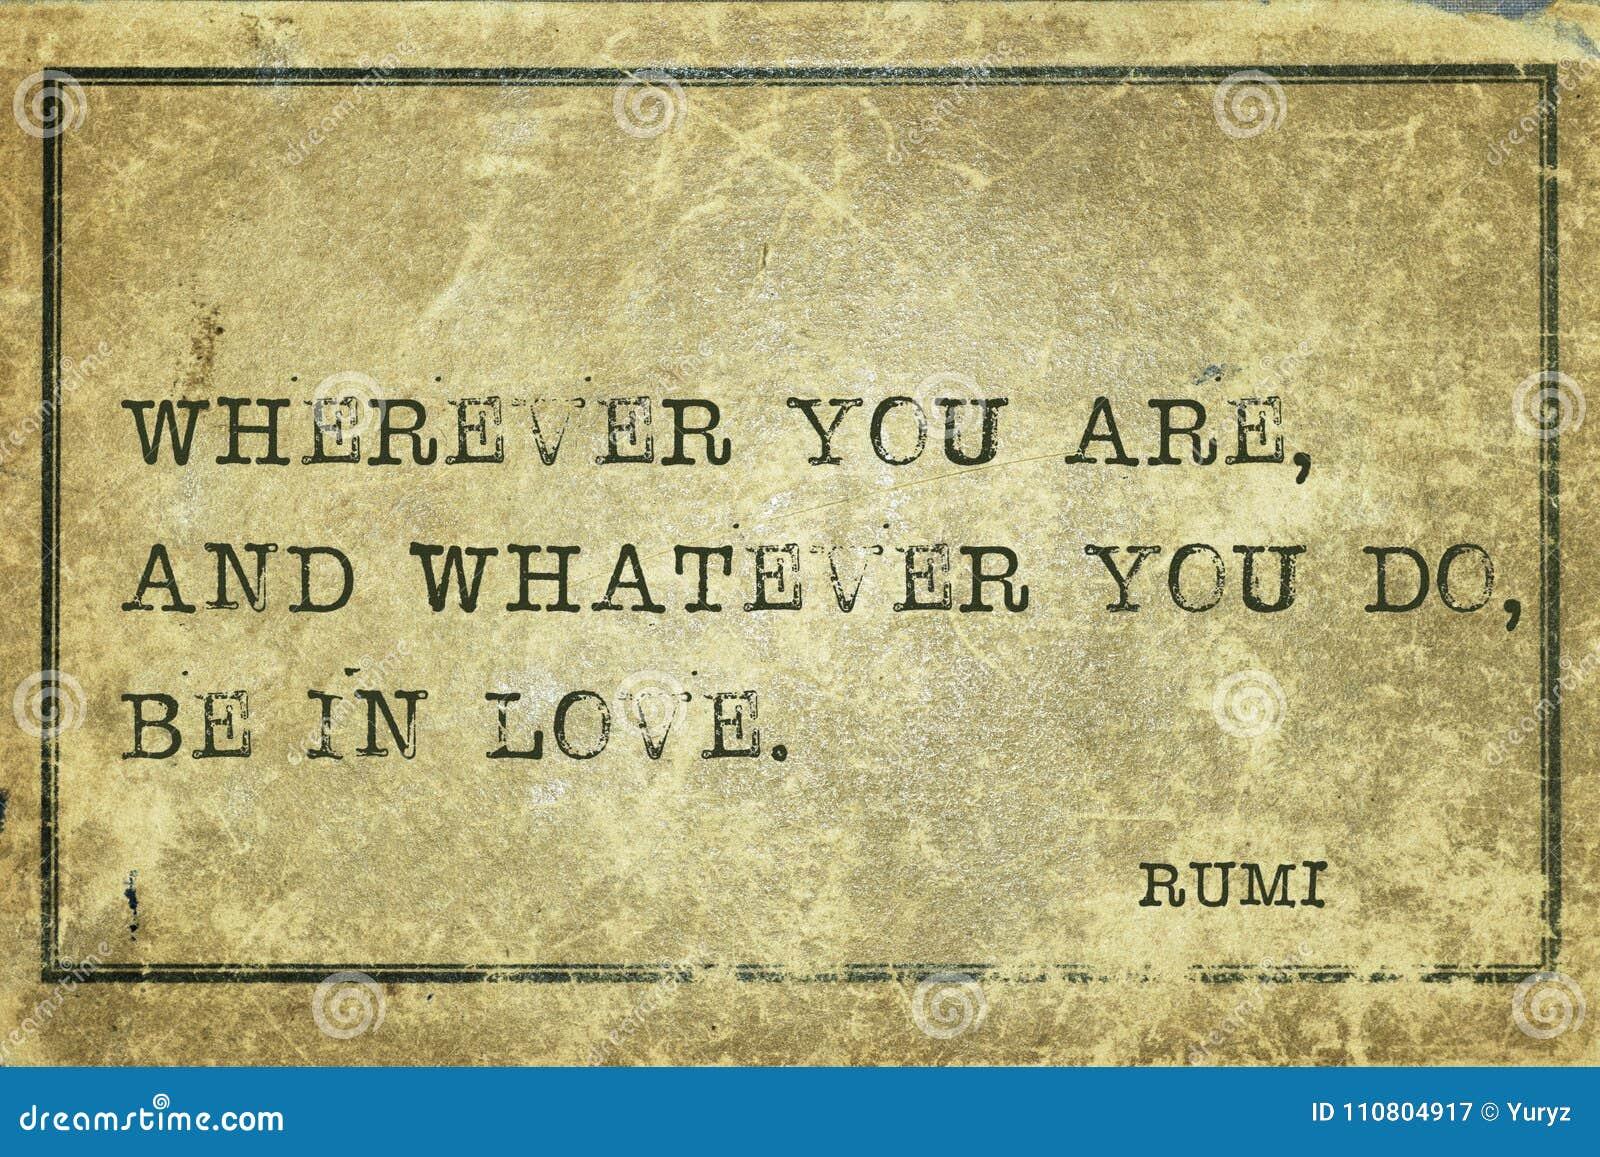 In Love Rumi Stock Illustration Illustration Of Cardboard 110804917